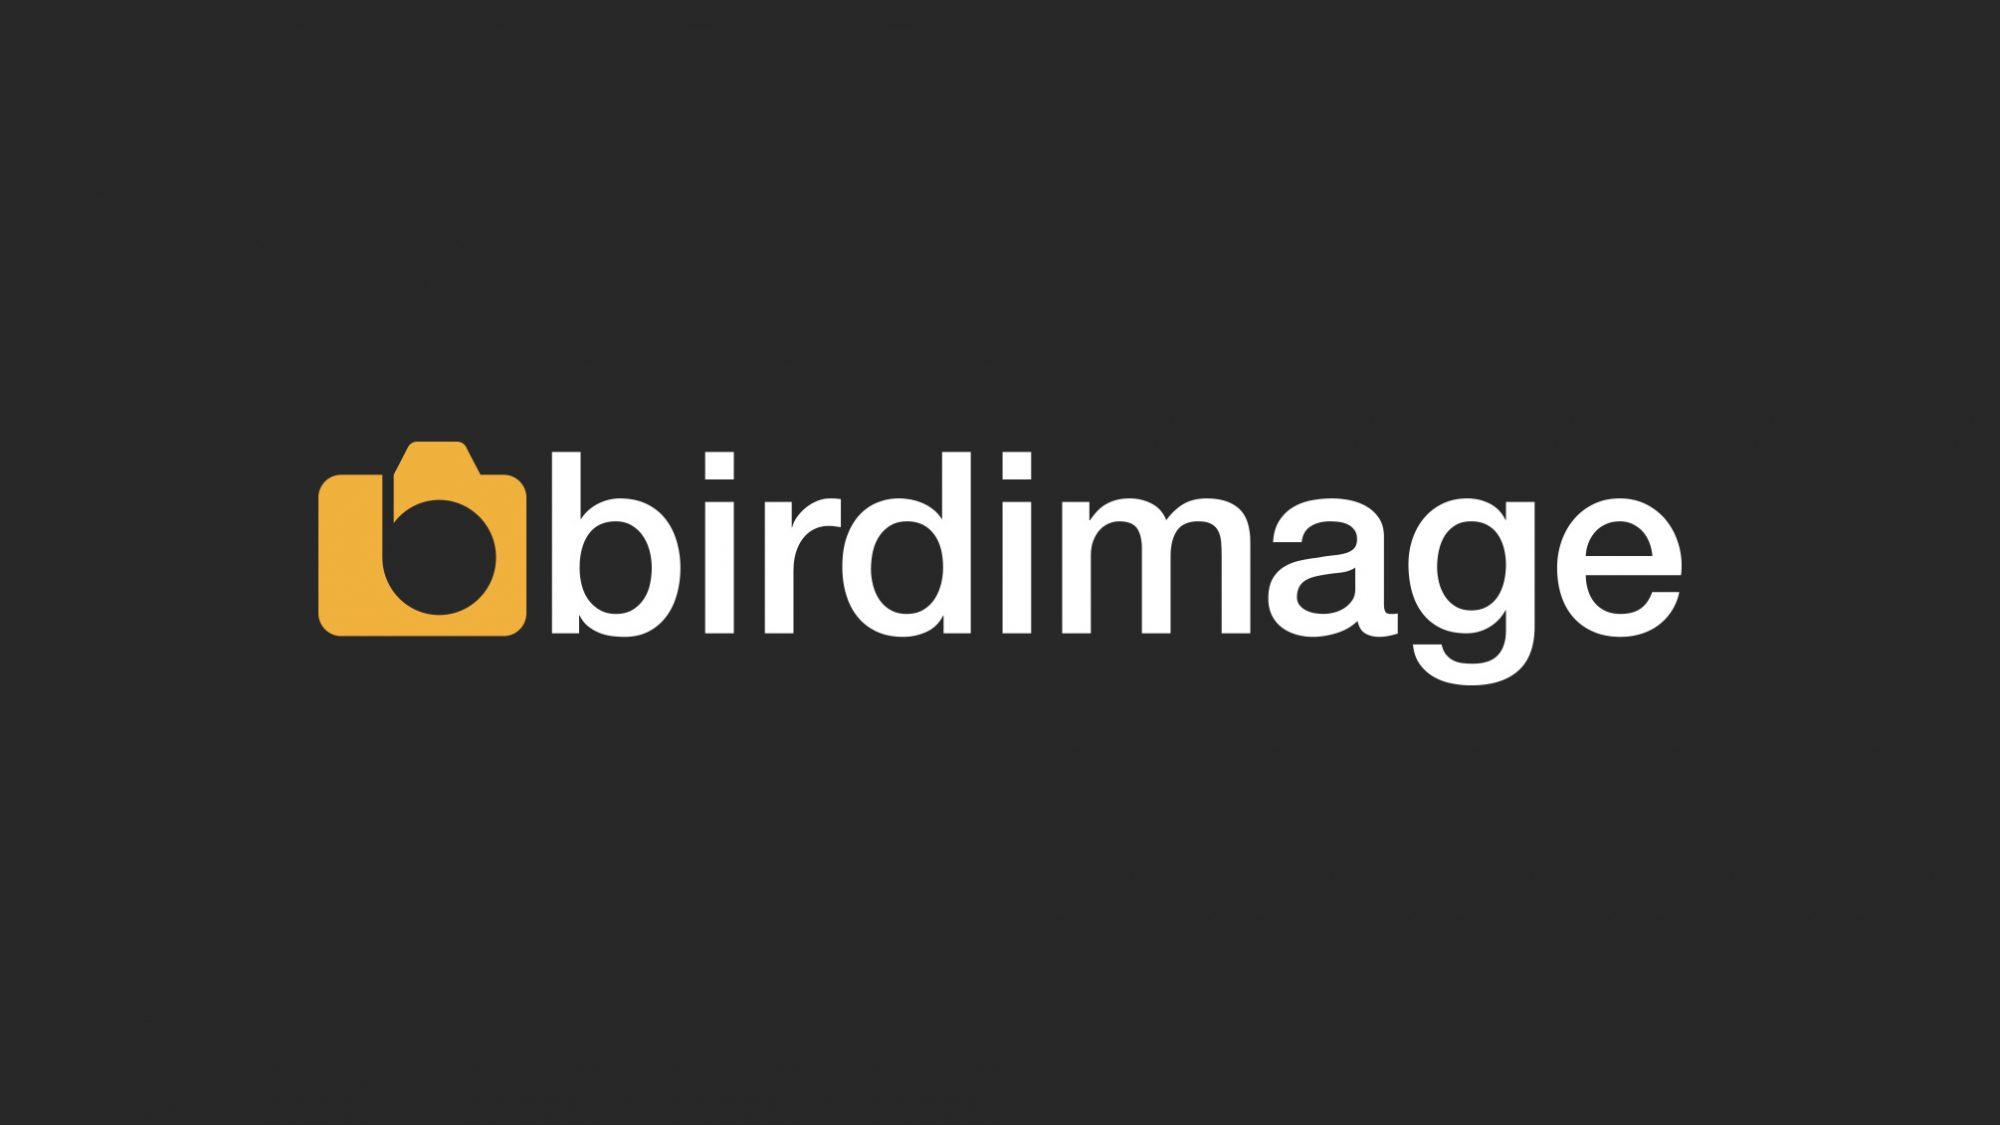 birdimage-identity-drawperfect-pfi